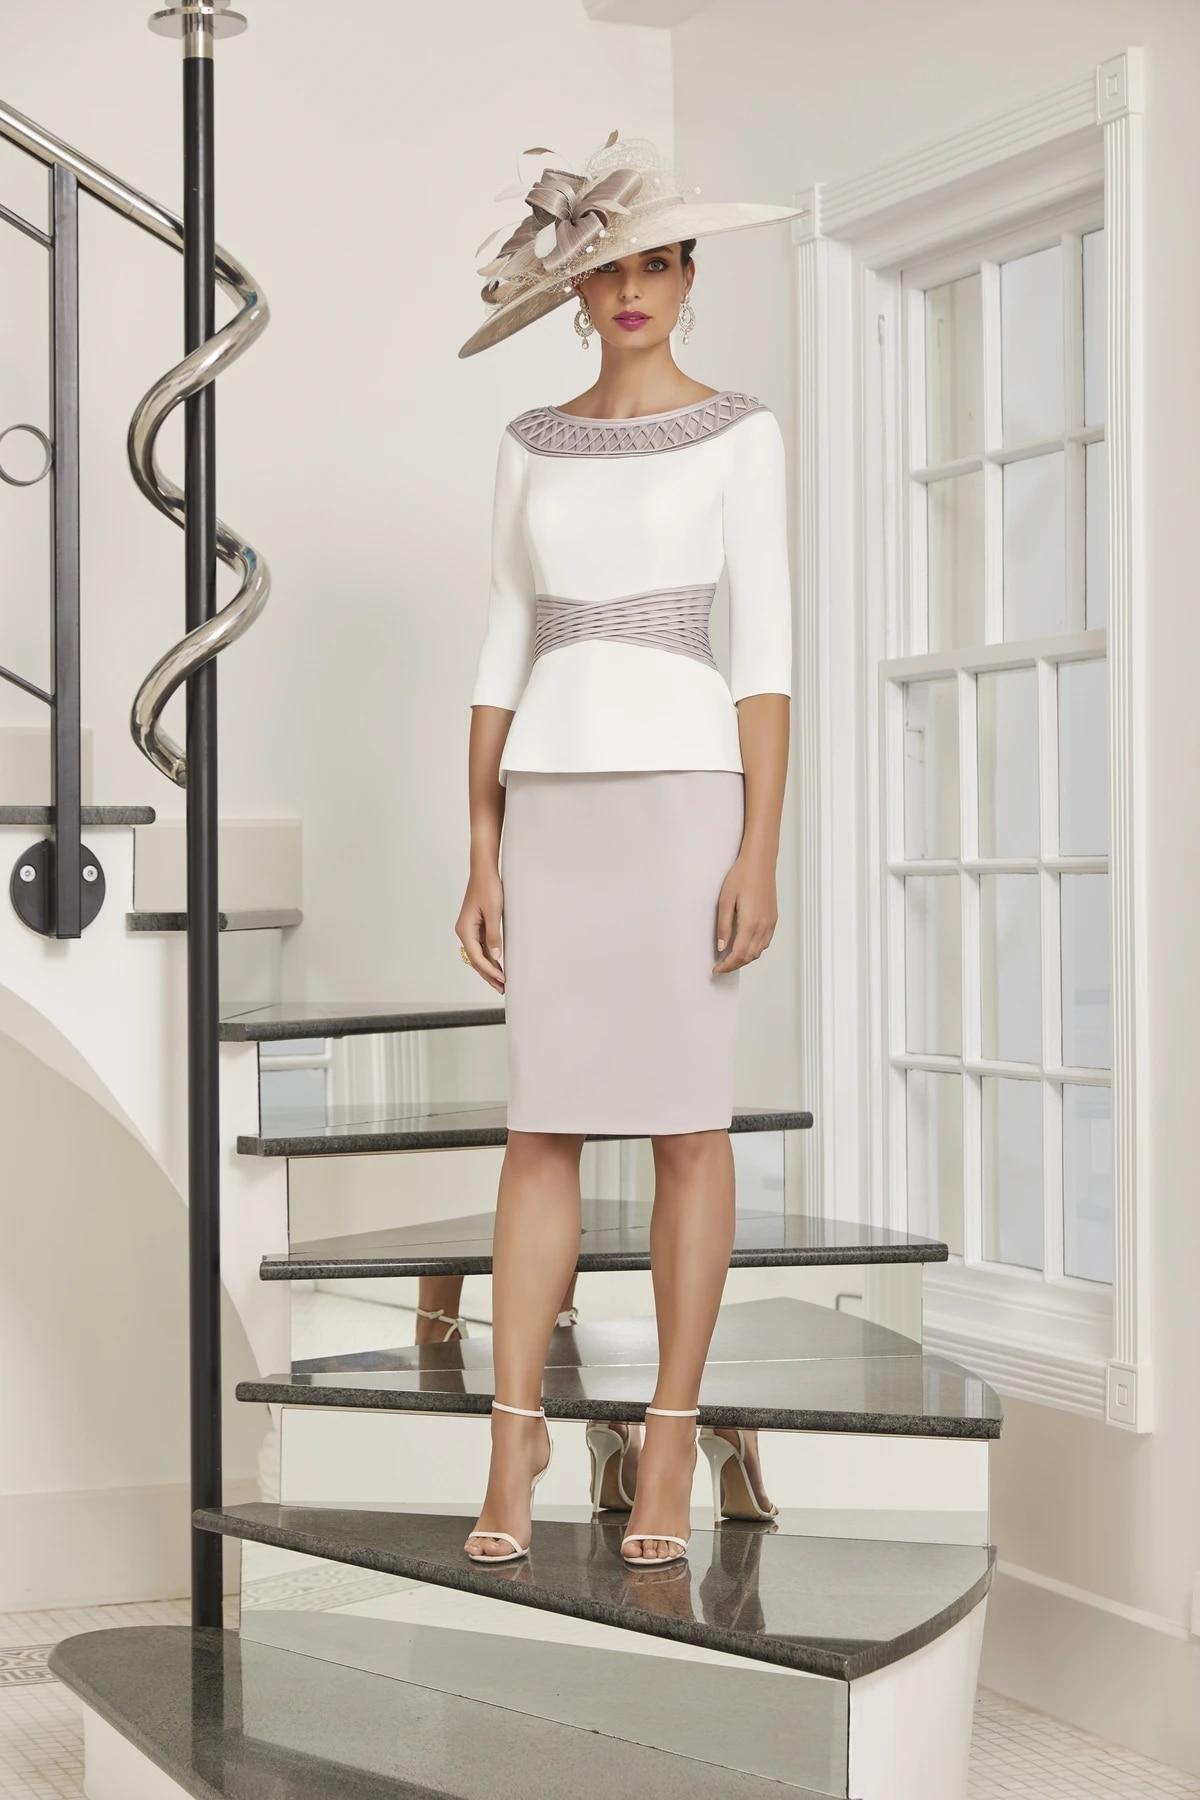 Plus Size Mother Of The Bride Dresses Sheath Scoop Half Sleeves Knee Length Satin Short Groom Mother